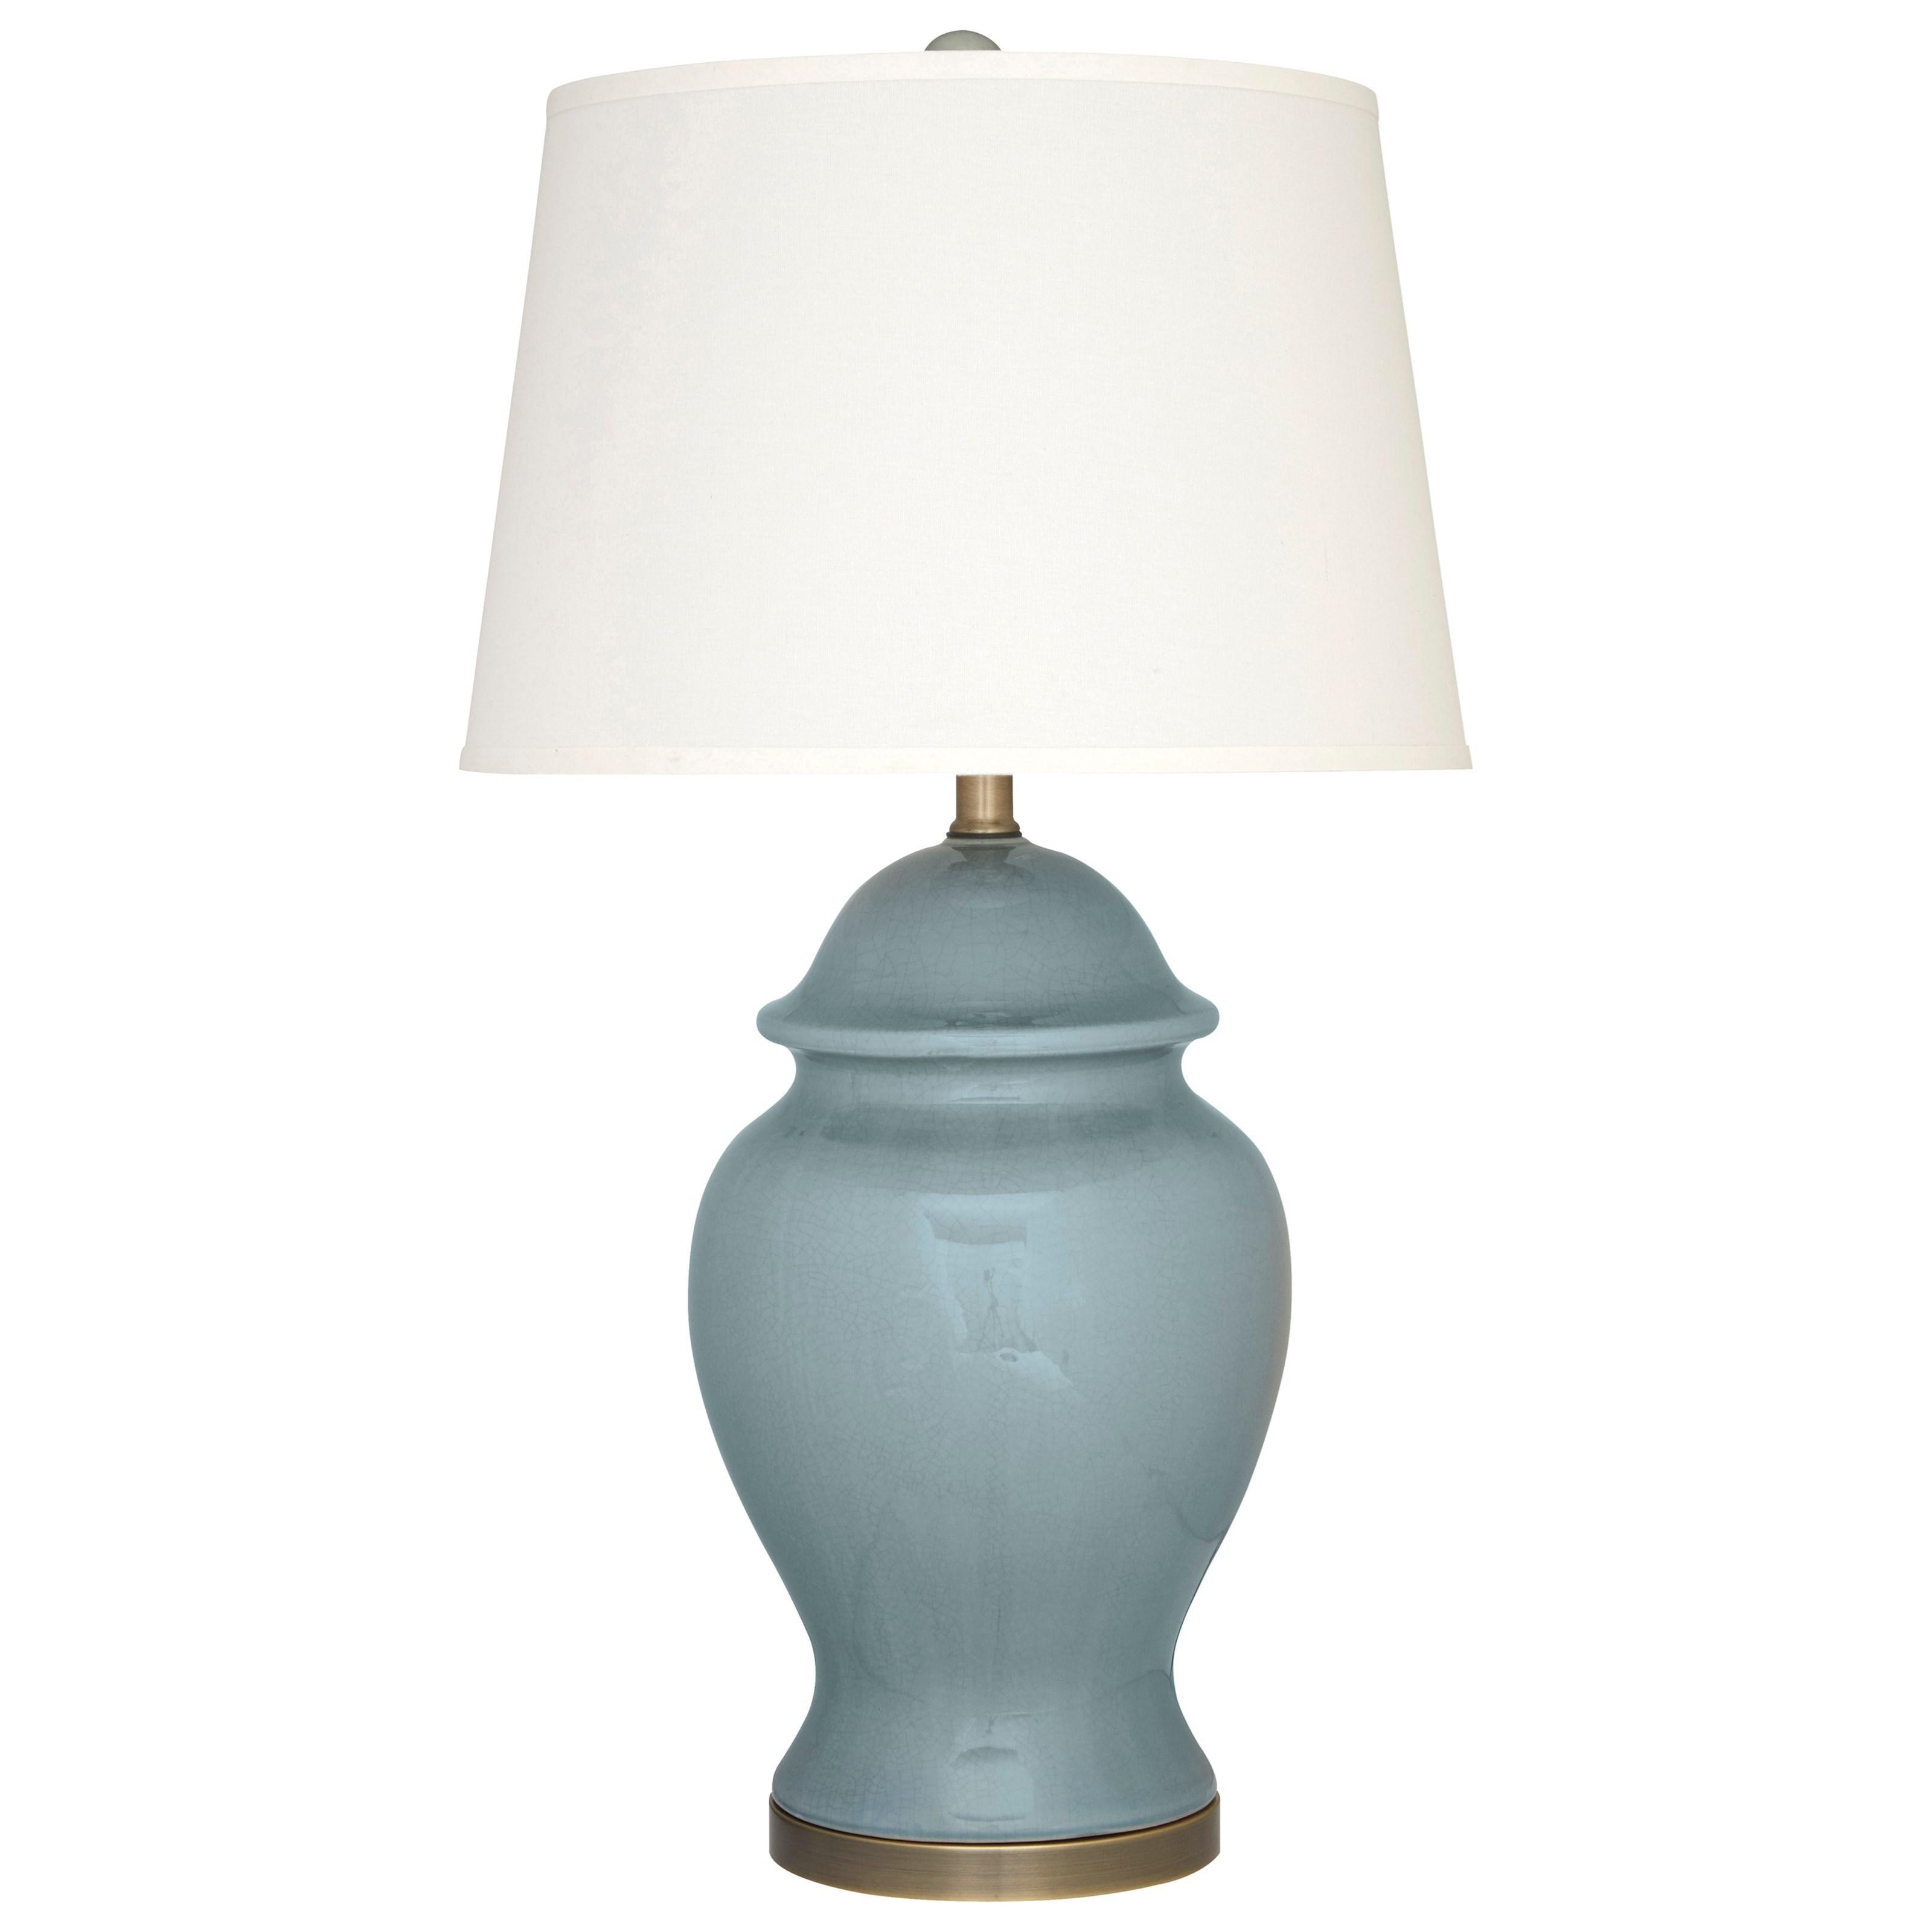 Blue ceramic table lamp - Signature Design By Ashley Lamps Vintage Style Darena Blue Ceramic Table Lamp Item Number